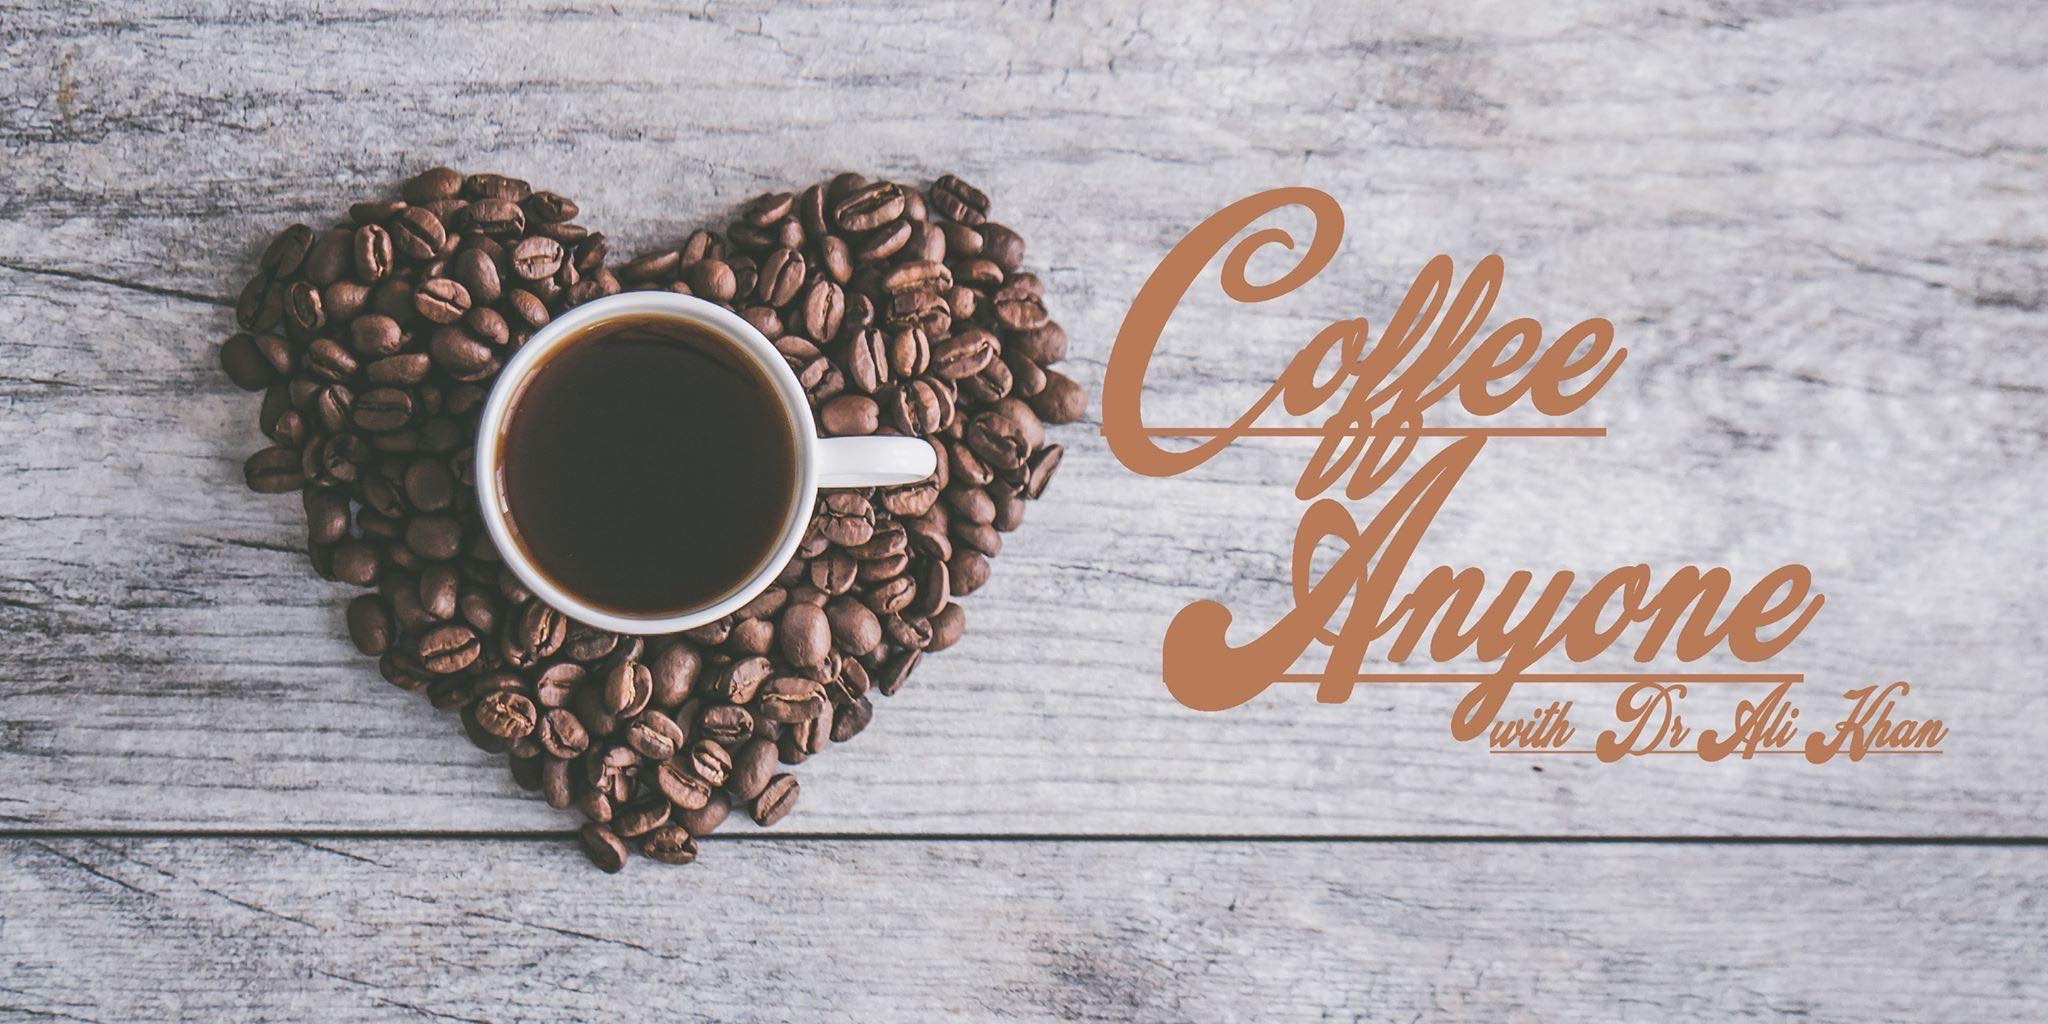 Coffee Anyone? graphic